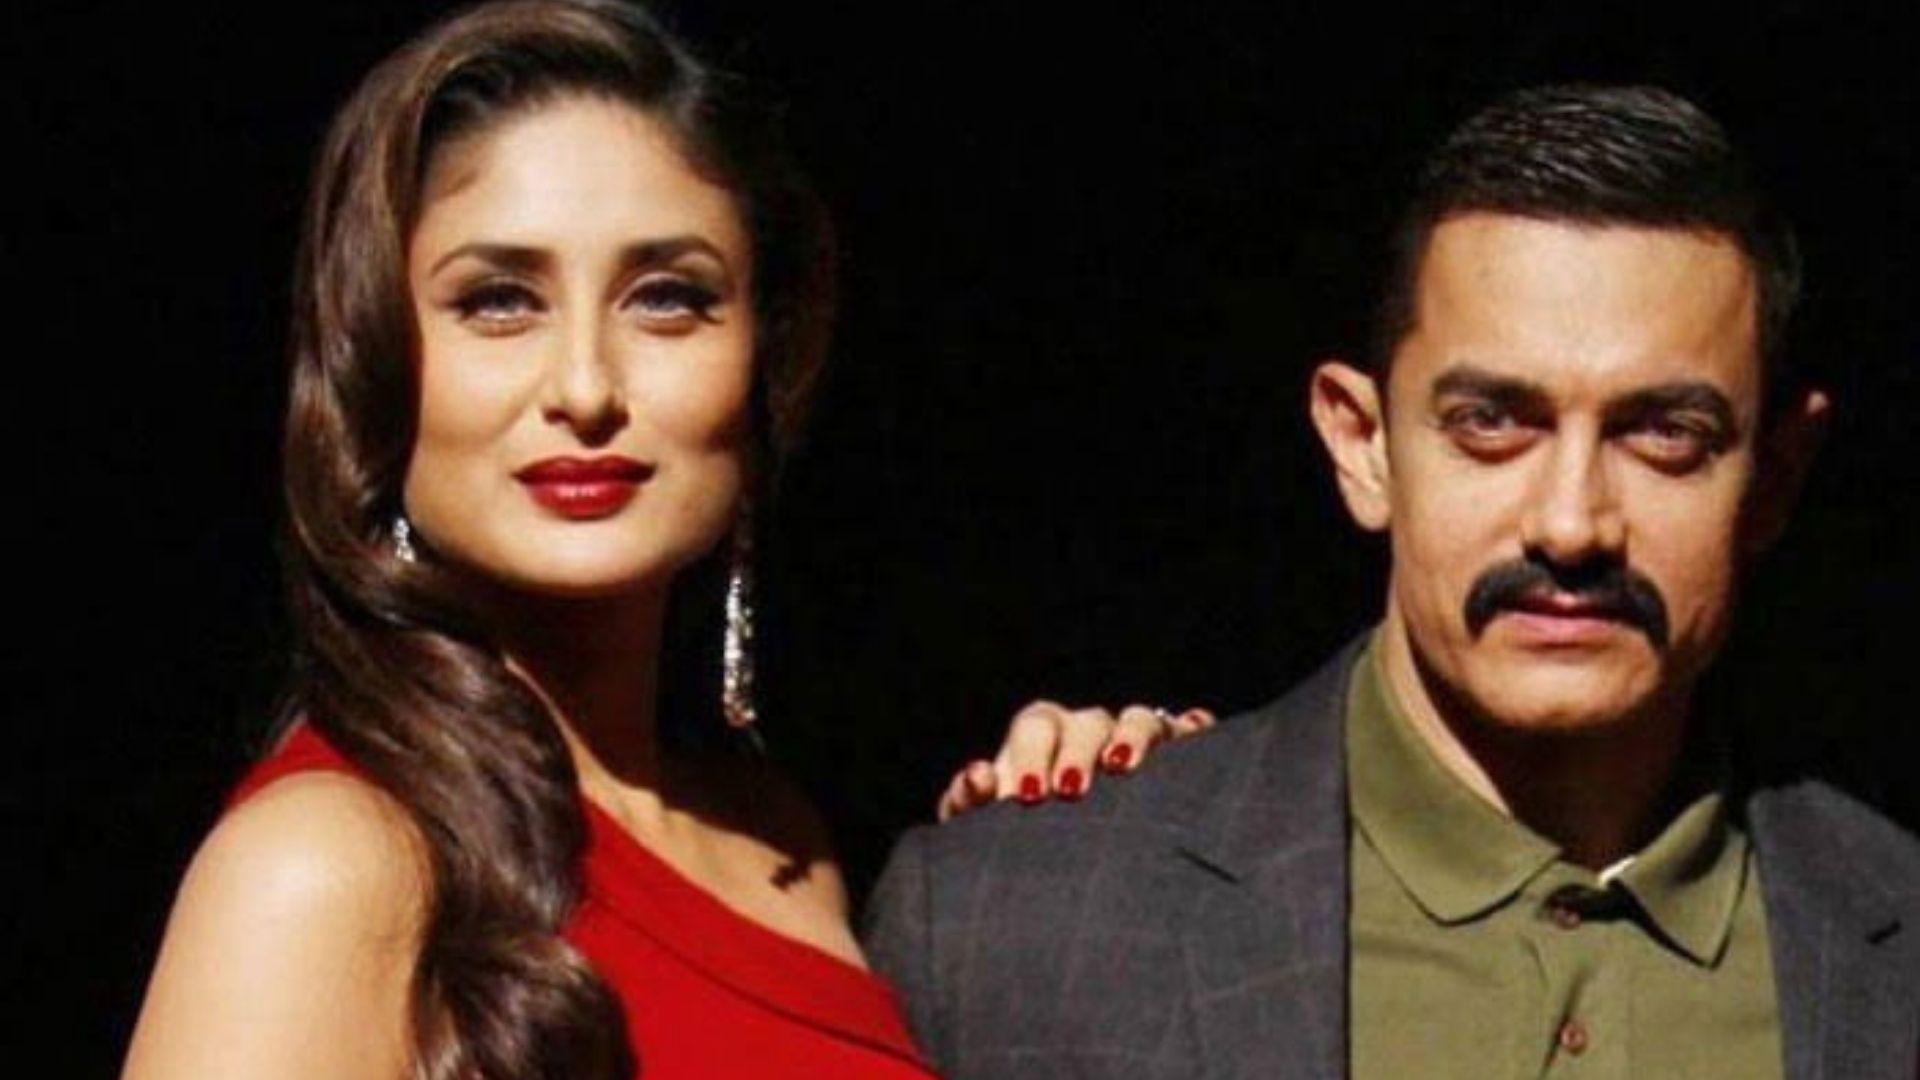 Kareena Kapoor Khan Says Her Laal Singh Chaddha Co-star Aamir Khan 'Has Been Through A Lot'